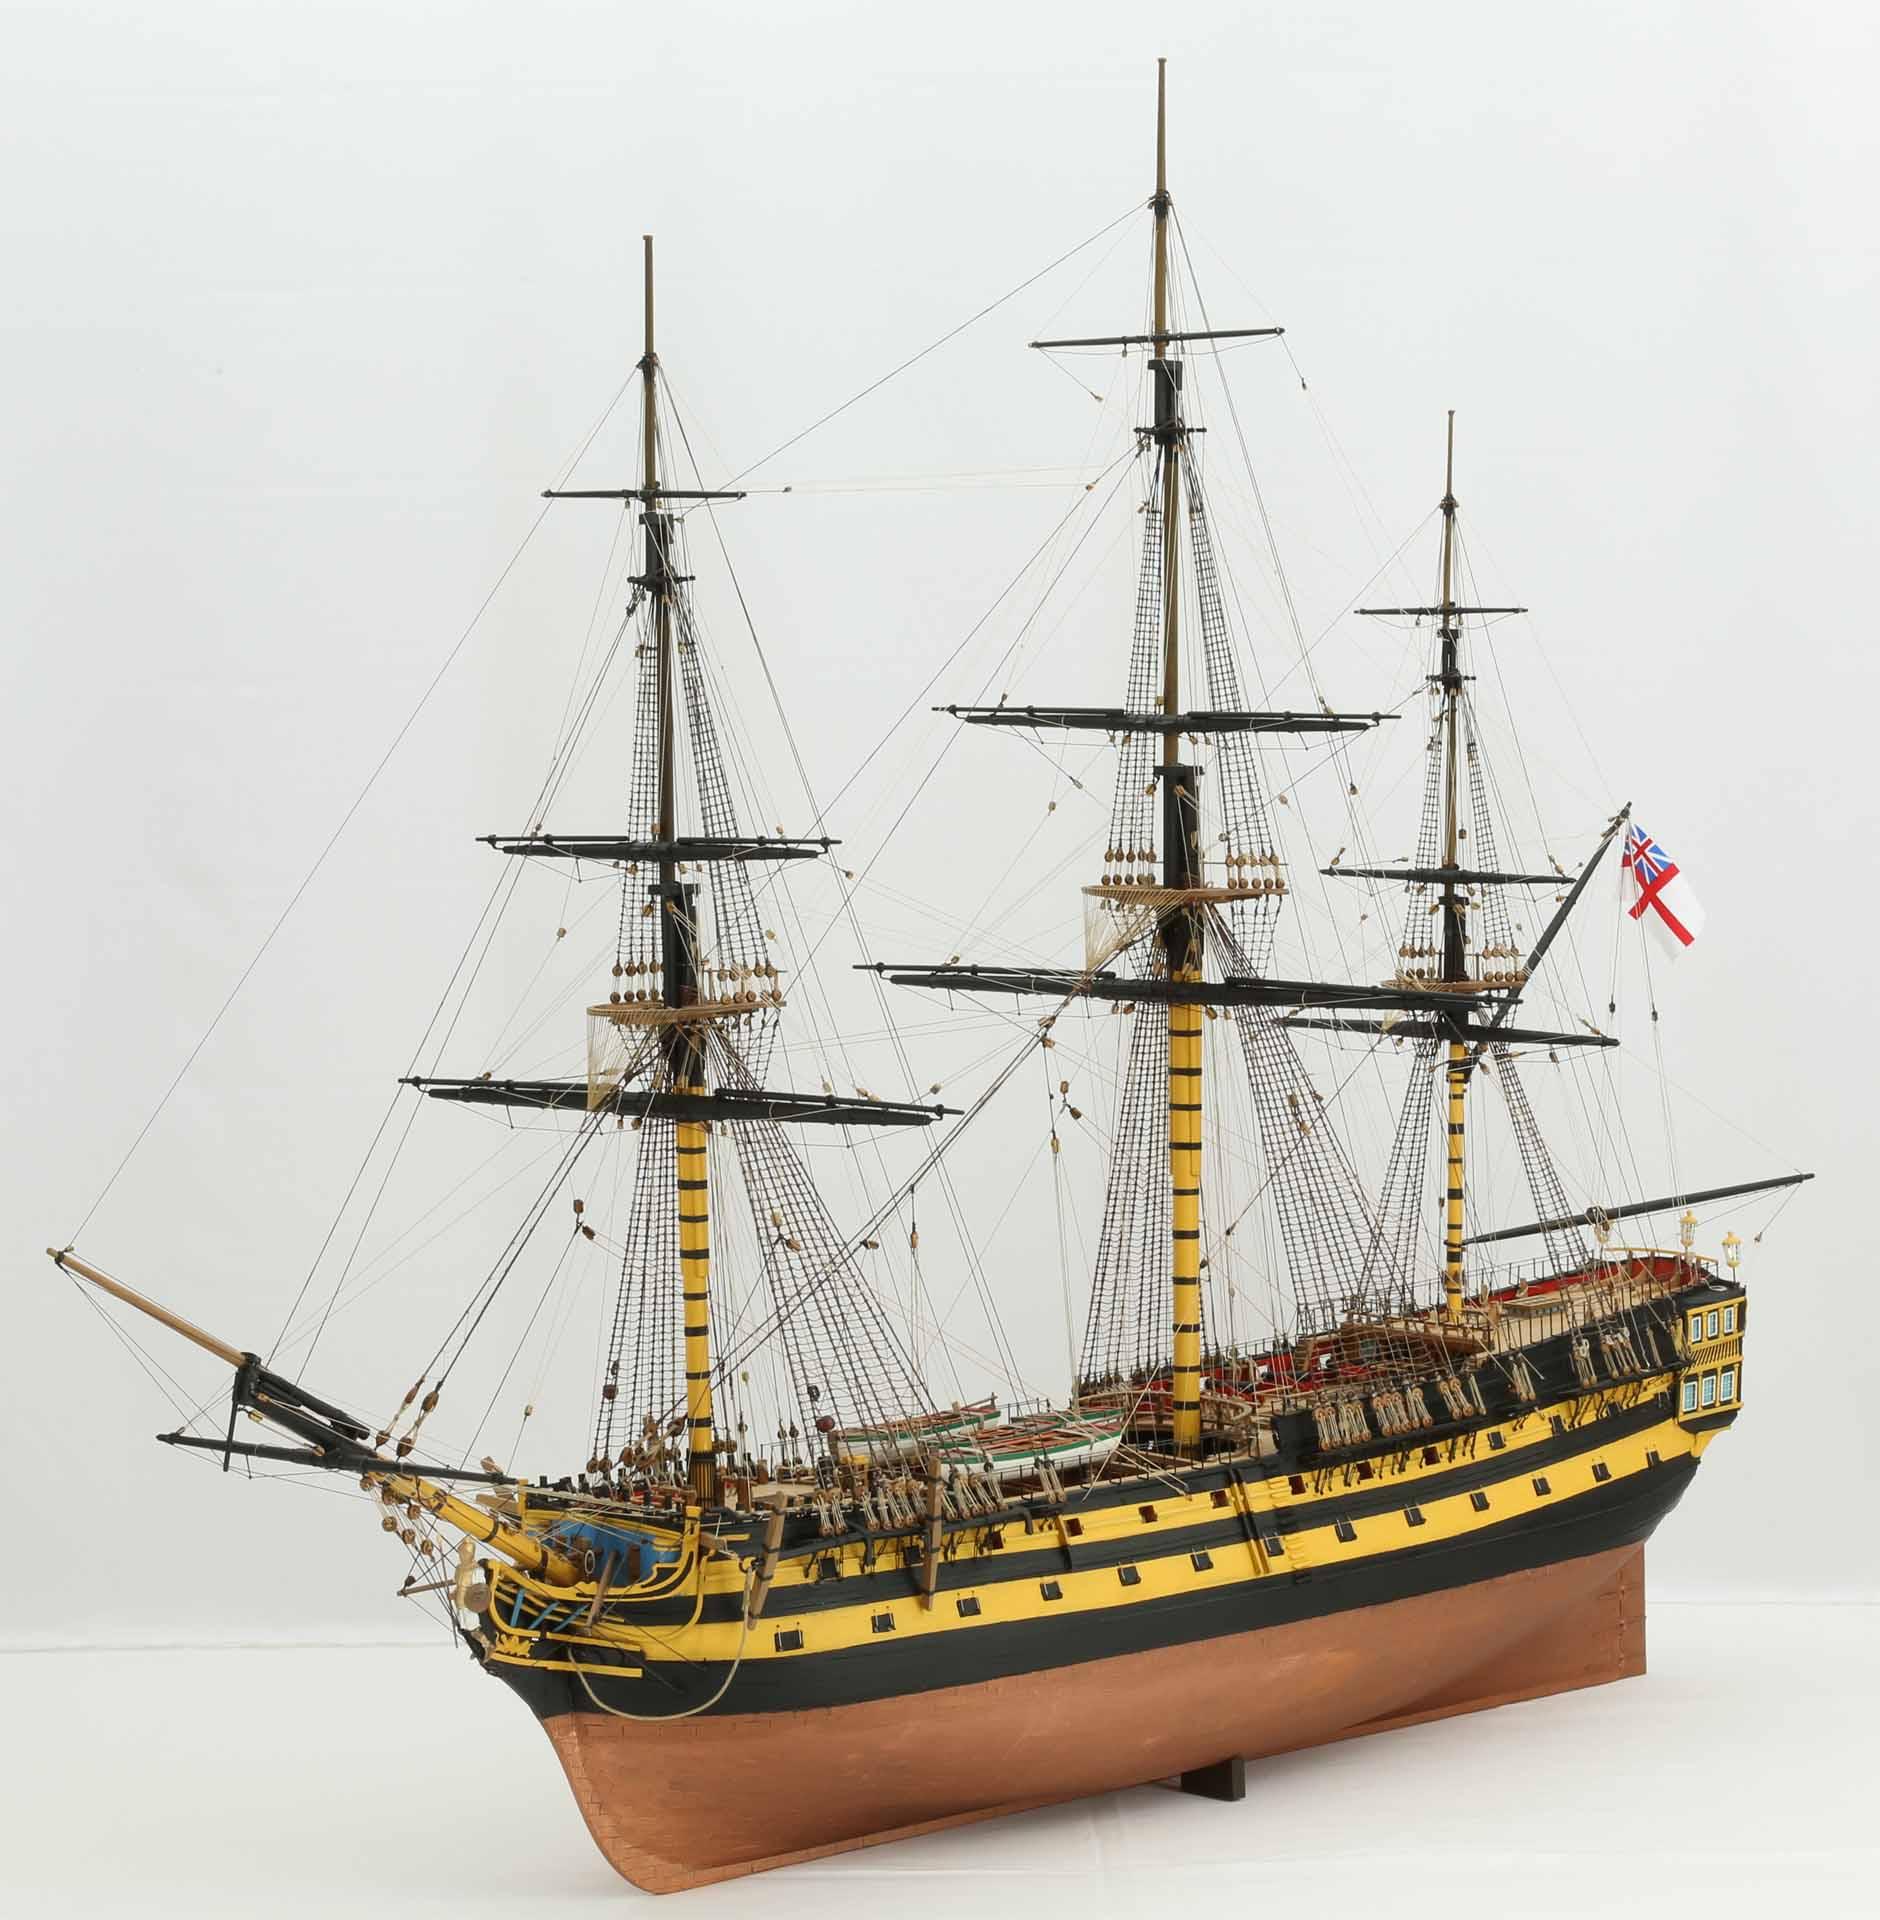 Line Of The British Ship Models Wiring Diagrams Design Boost Buck Converter Using Hv9930 Model Hms Agamemnon 1781 64 Gun Ships From